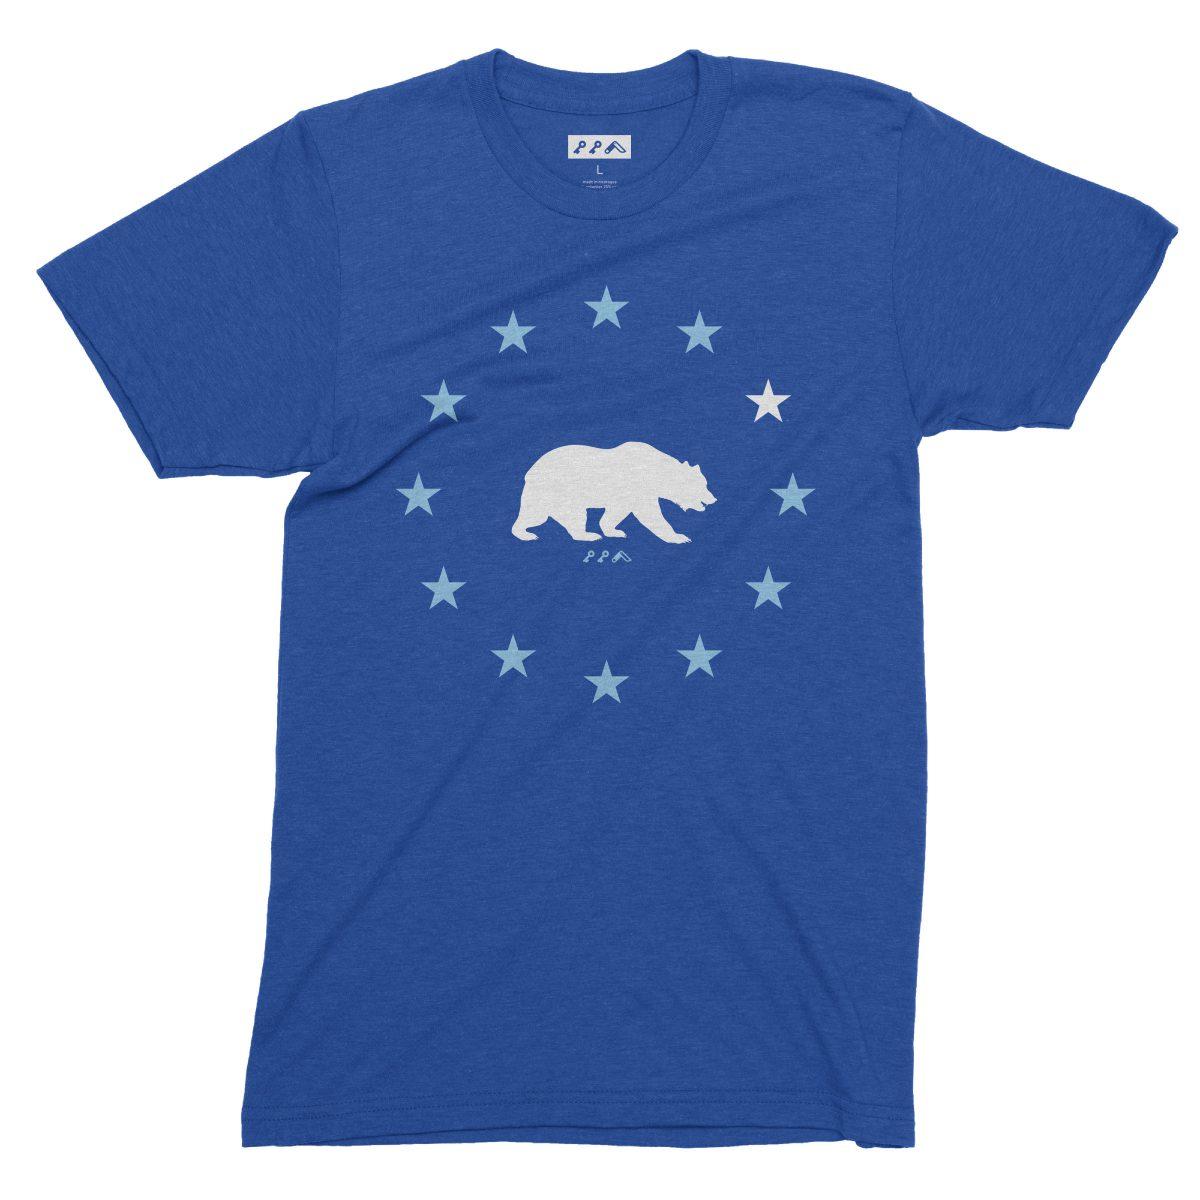 STAR GAZING california republic cal bears tees in dodger blue